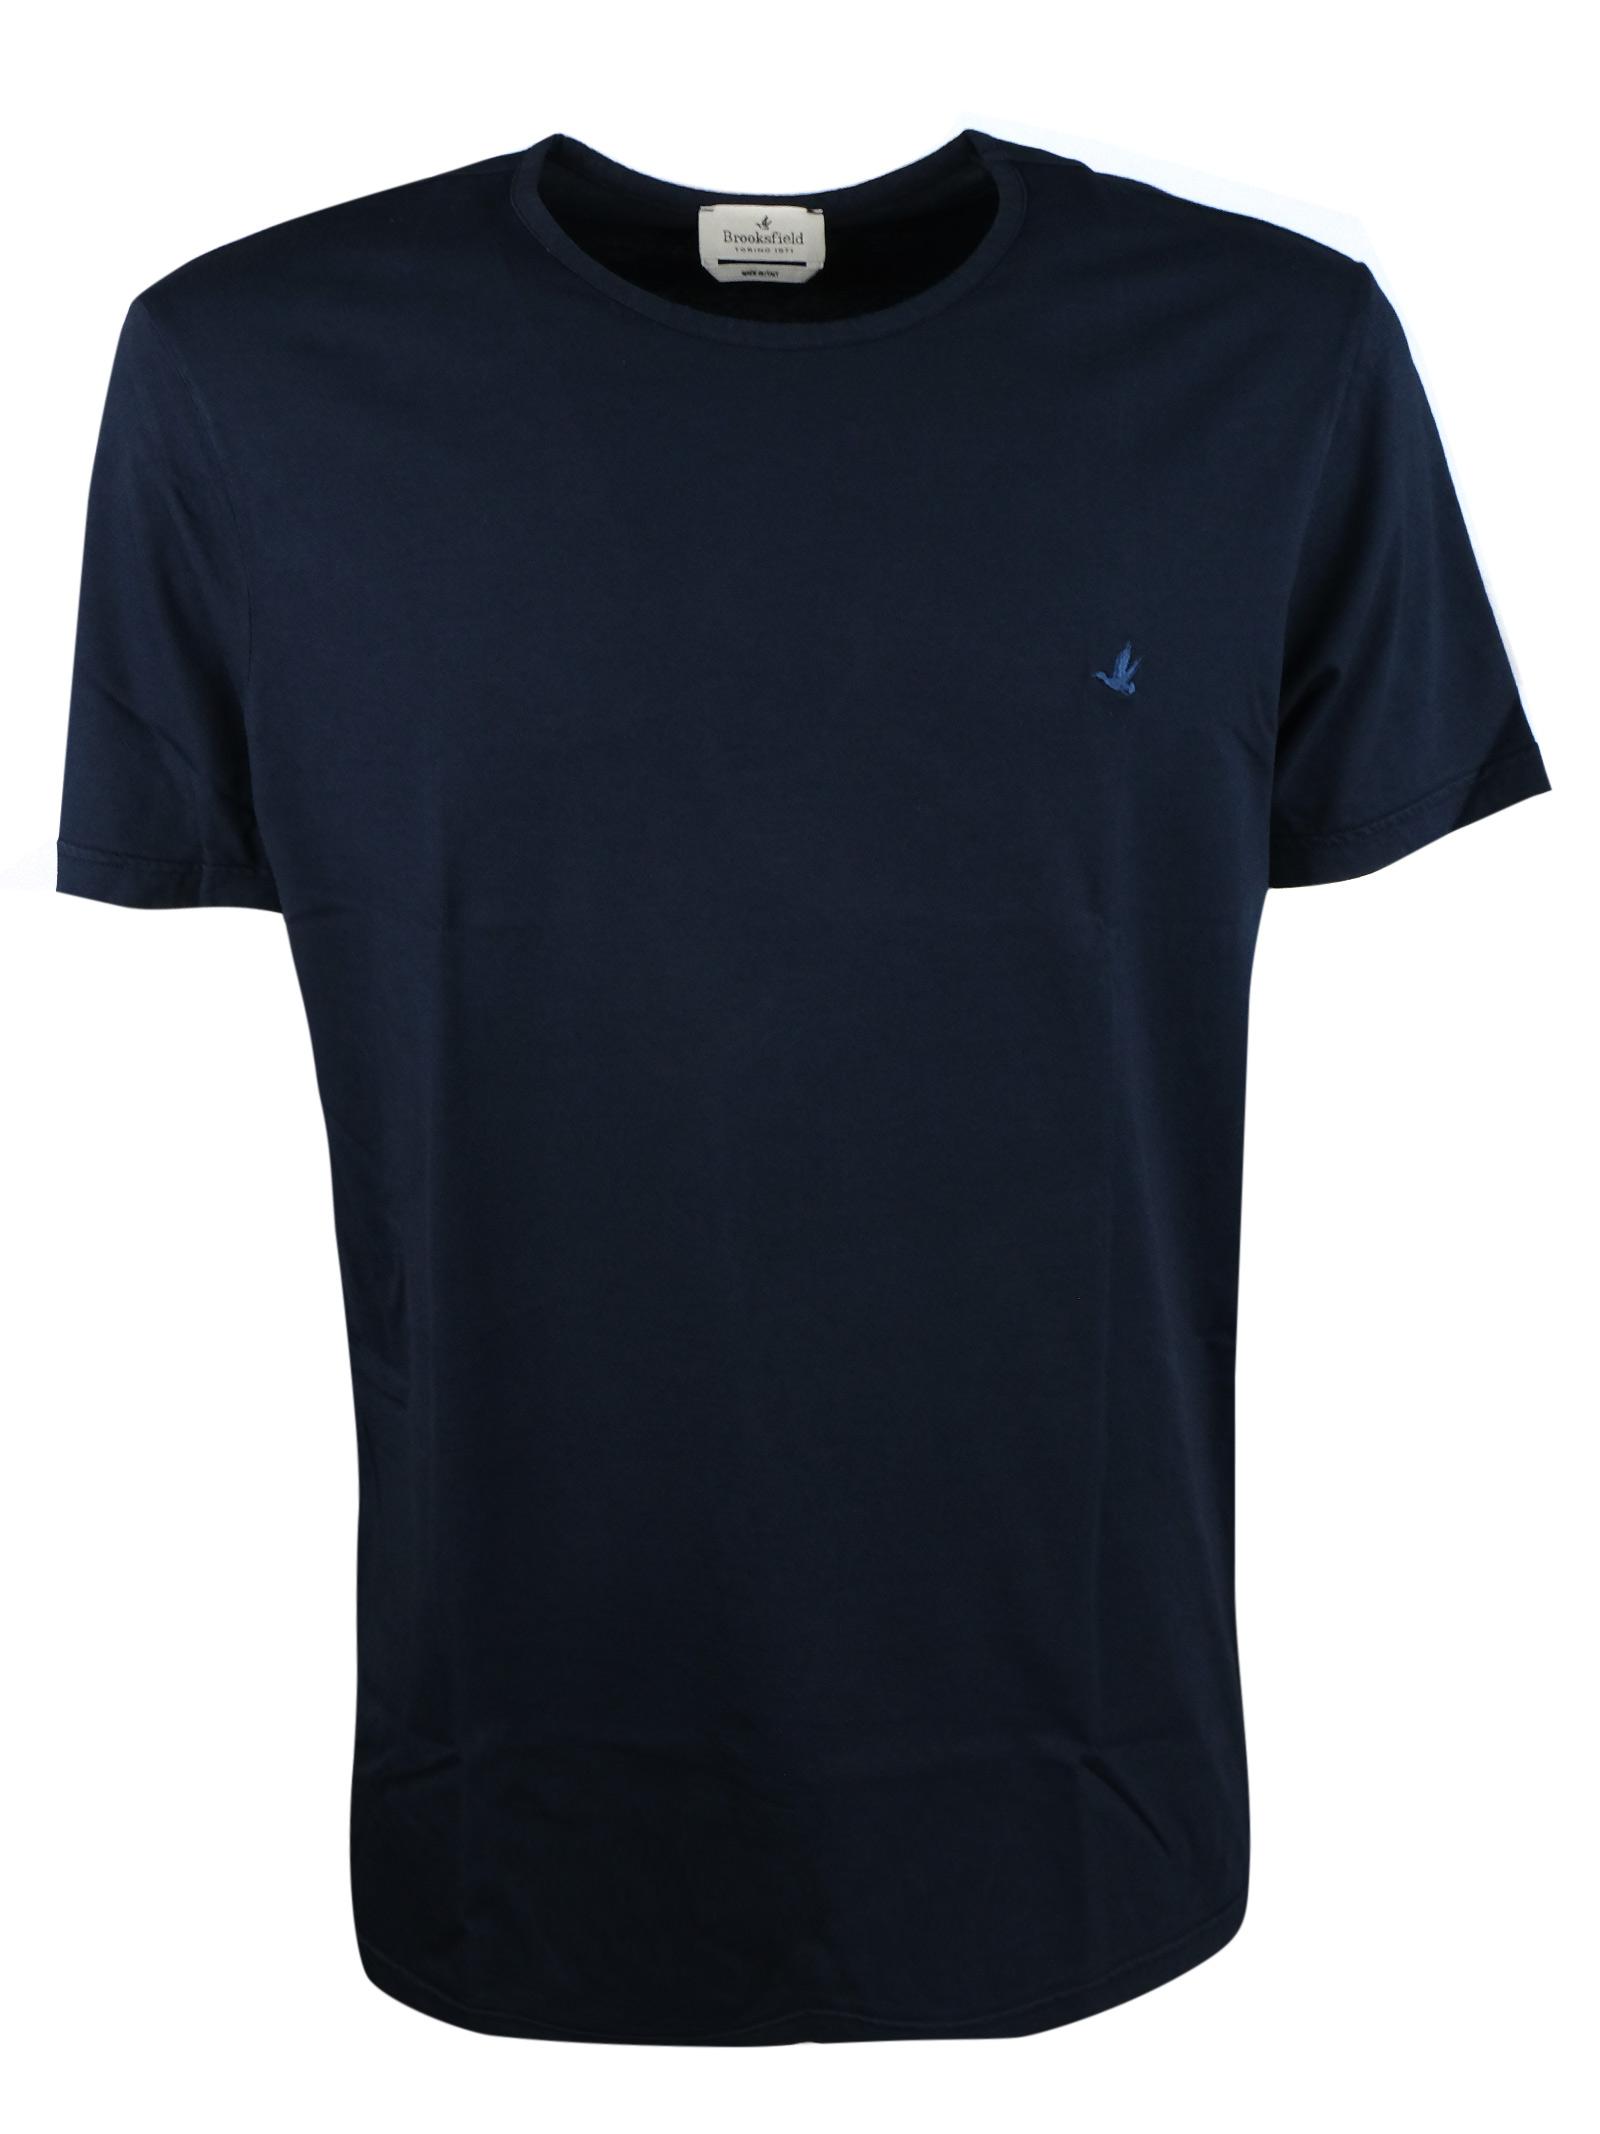 T-shirt tinta unita in cotone. BROOKSFIELD   T- shirt   200A.J0529608